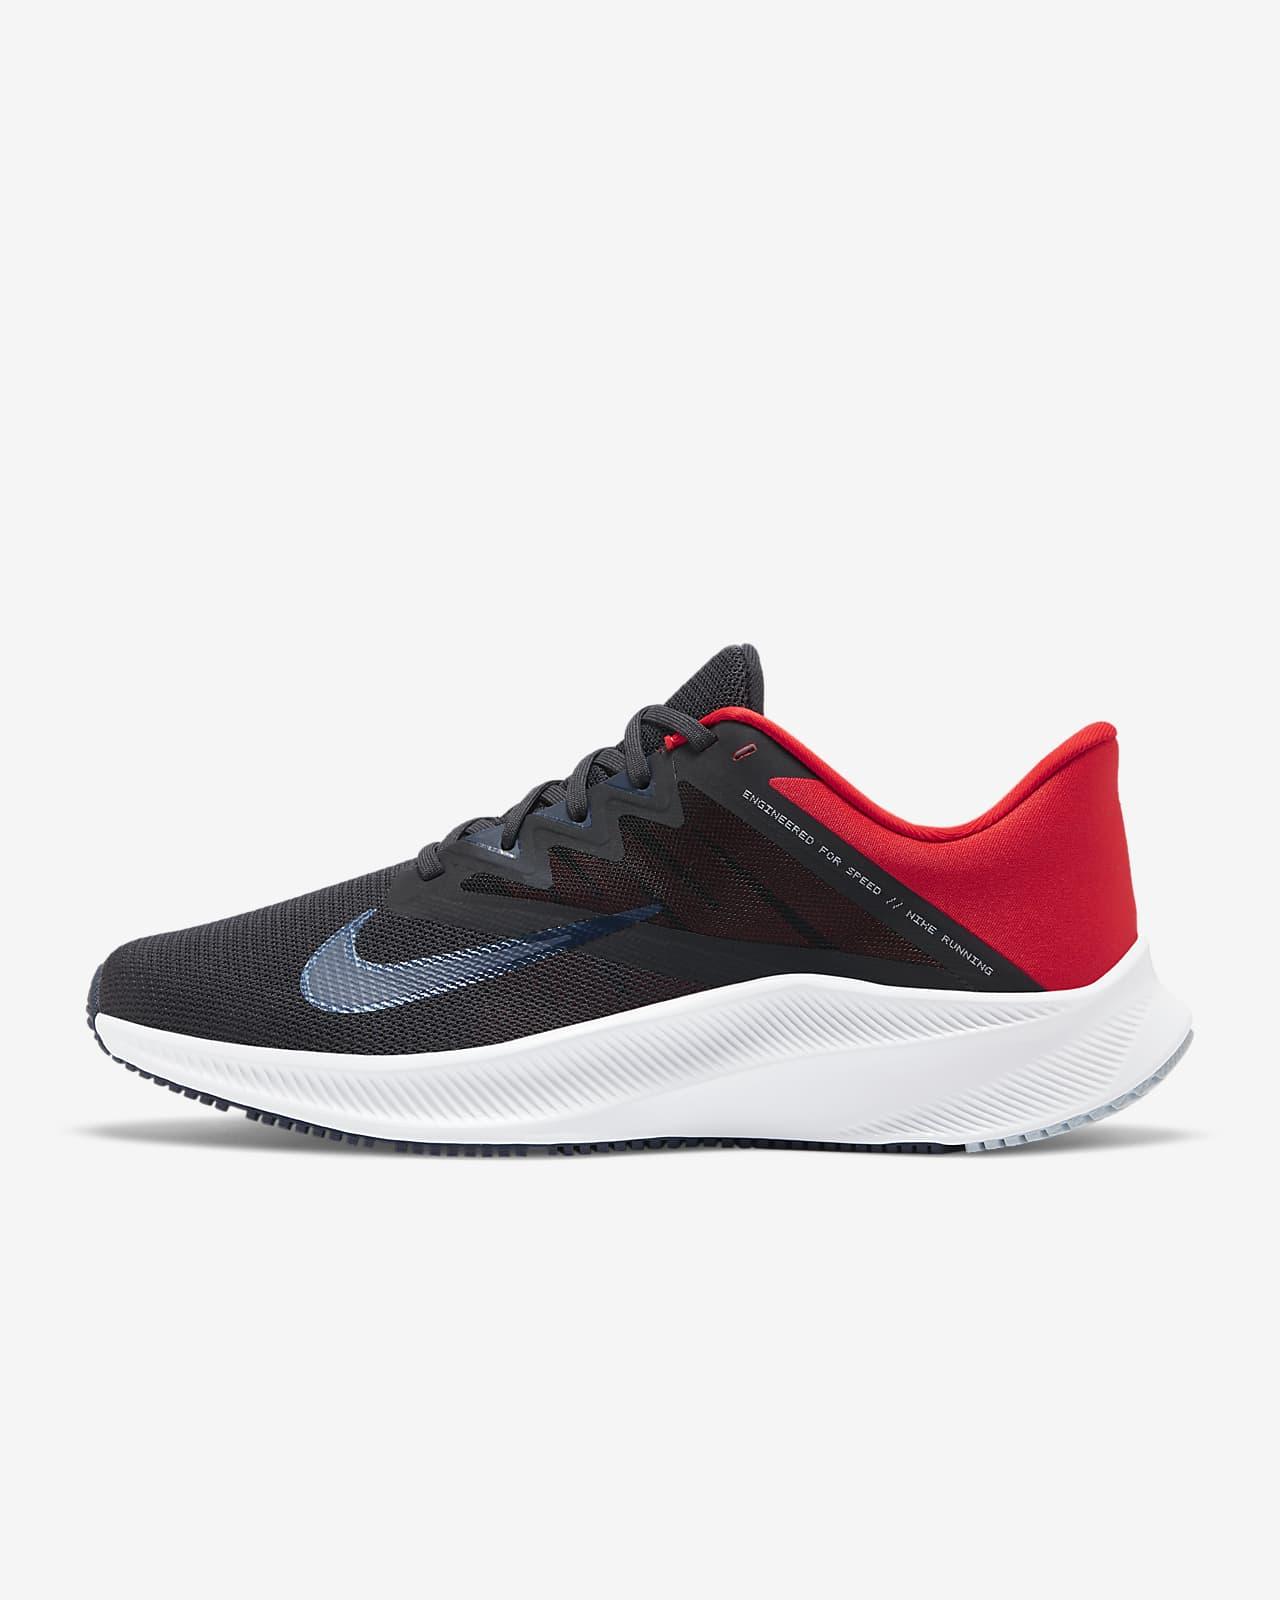 Calzado de running para hombre Nike Quest 3